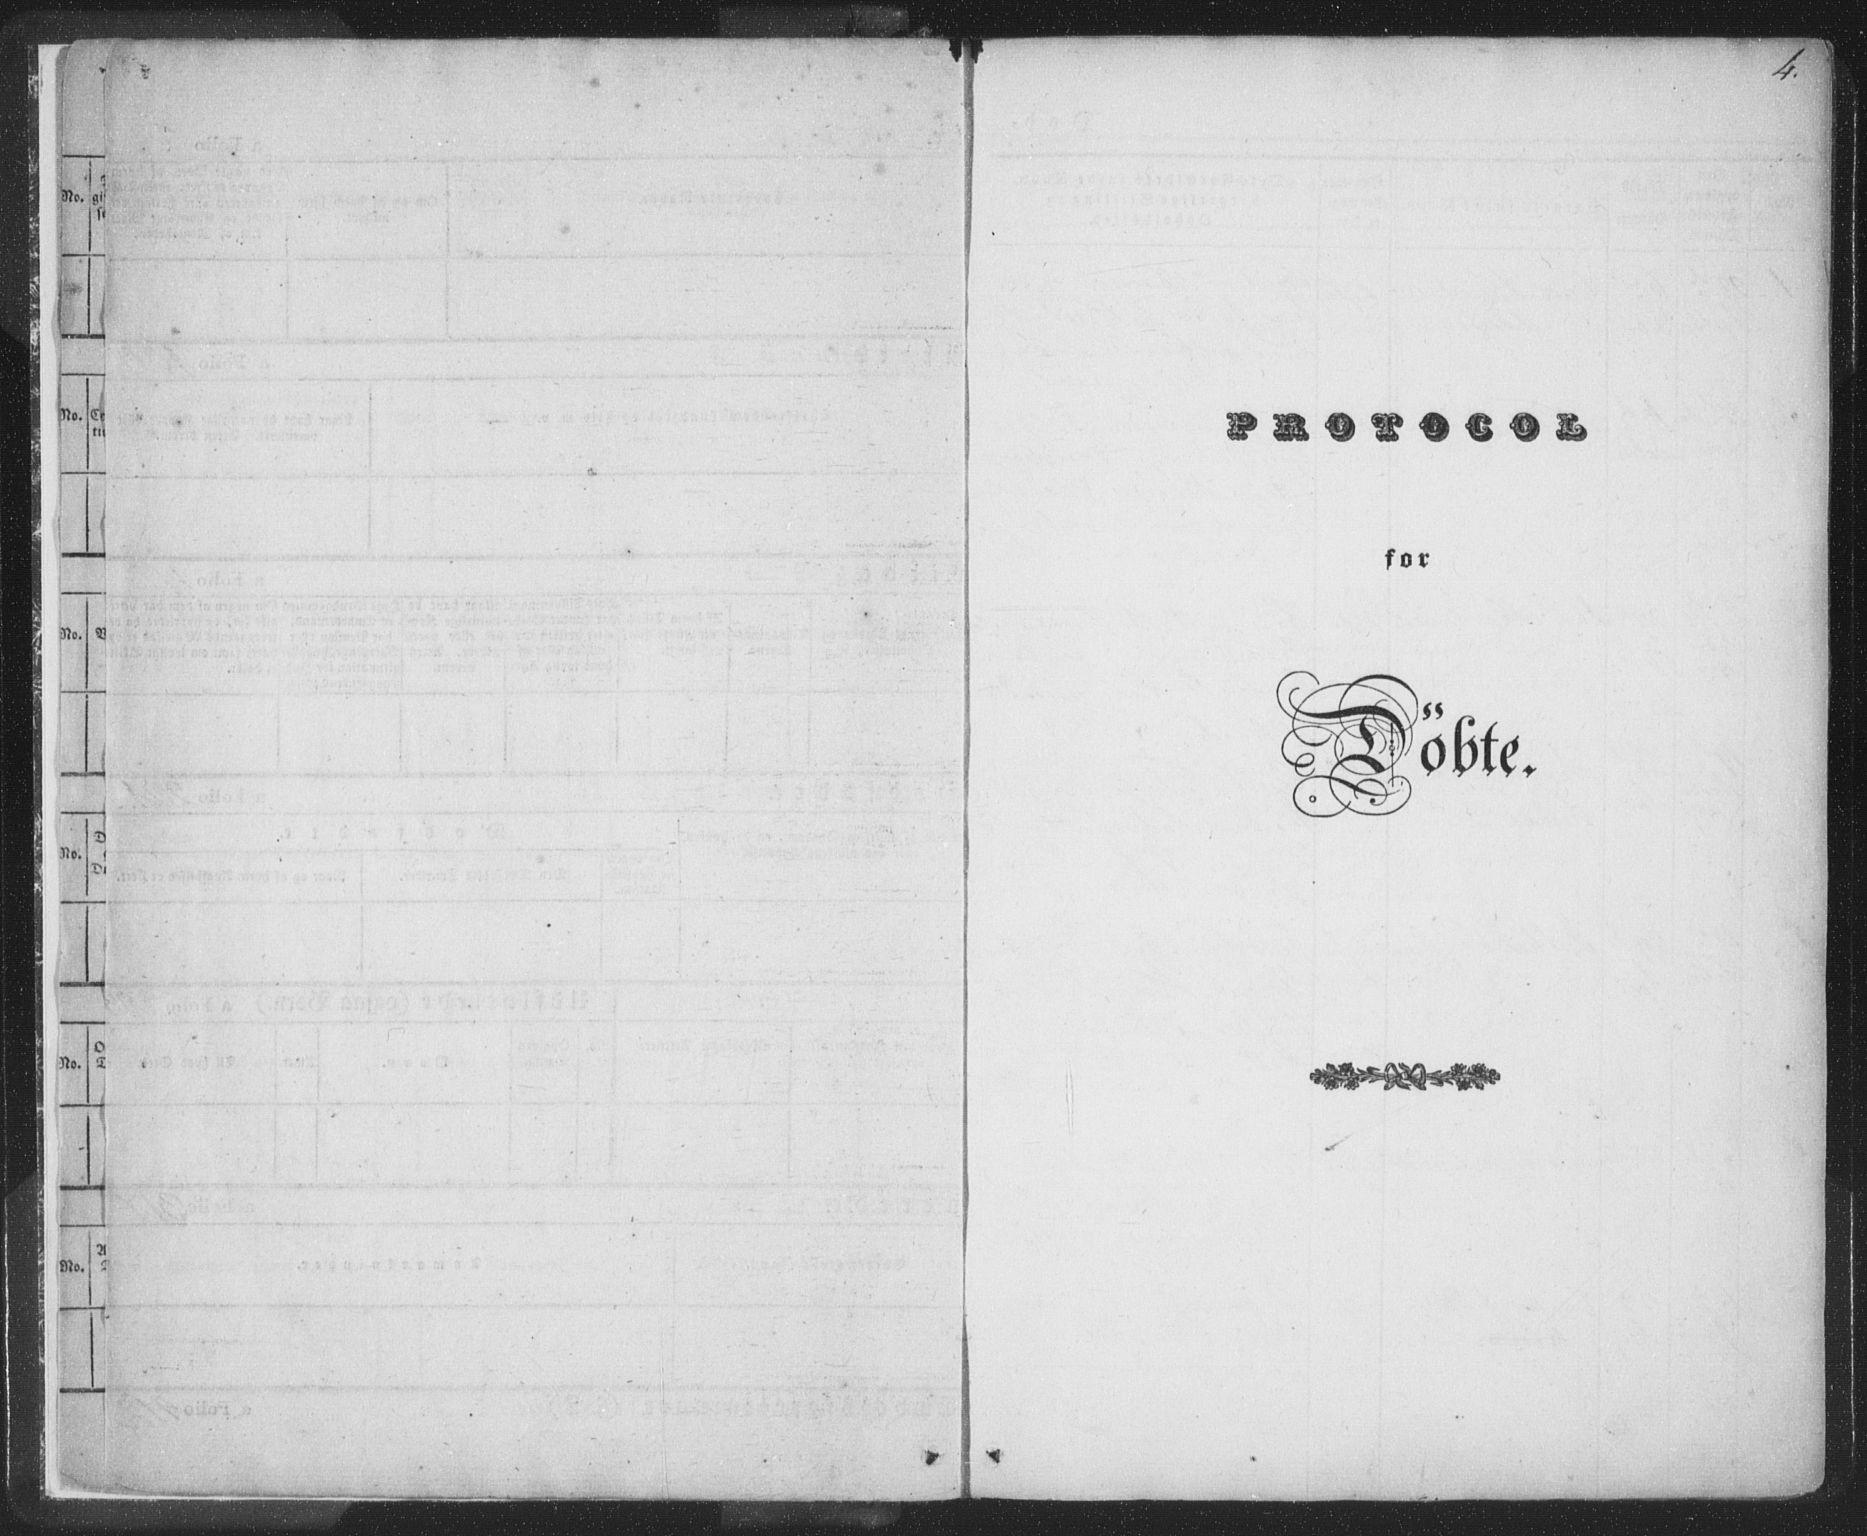 SAT, Ministerialprotokoller, klokkerbøker og fødselsregistre - Nordland, 885/L1202: Ministerialbok nr. 885A03, 1838-1859, s. 4